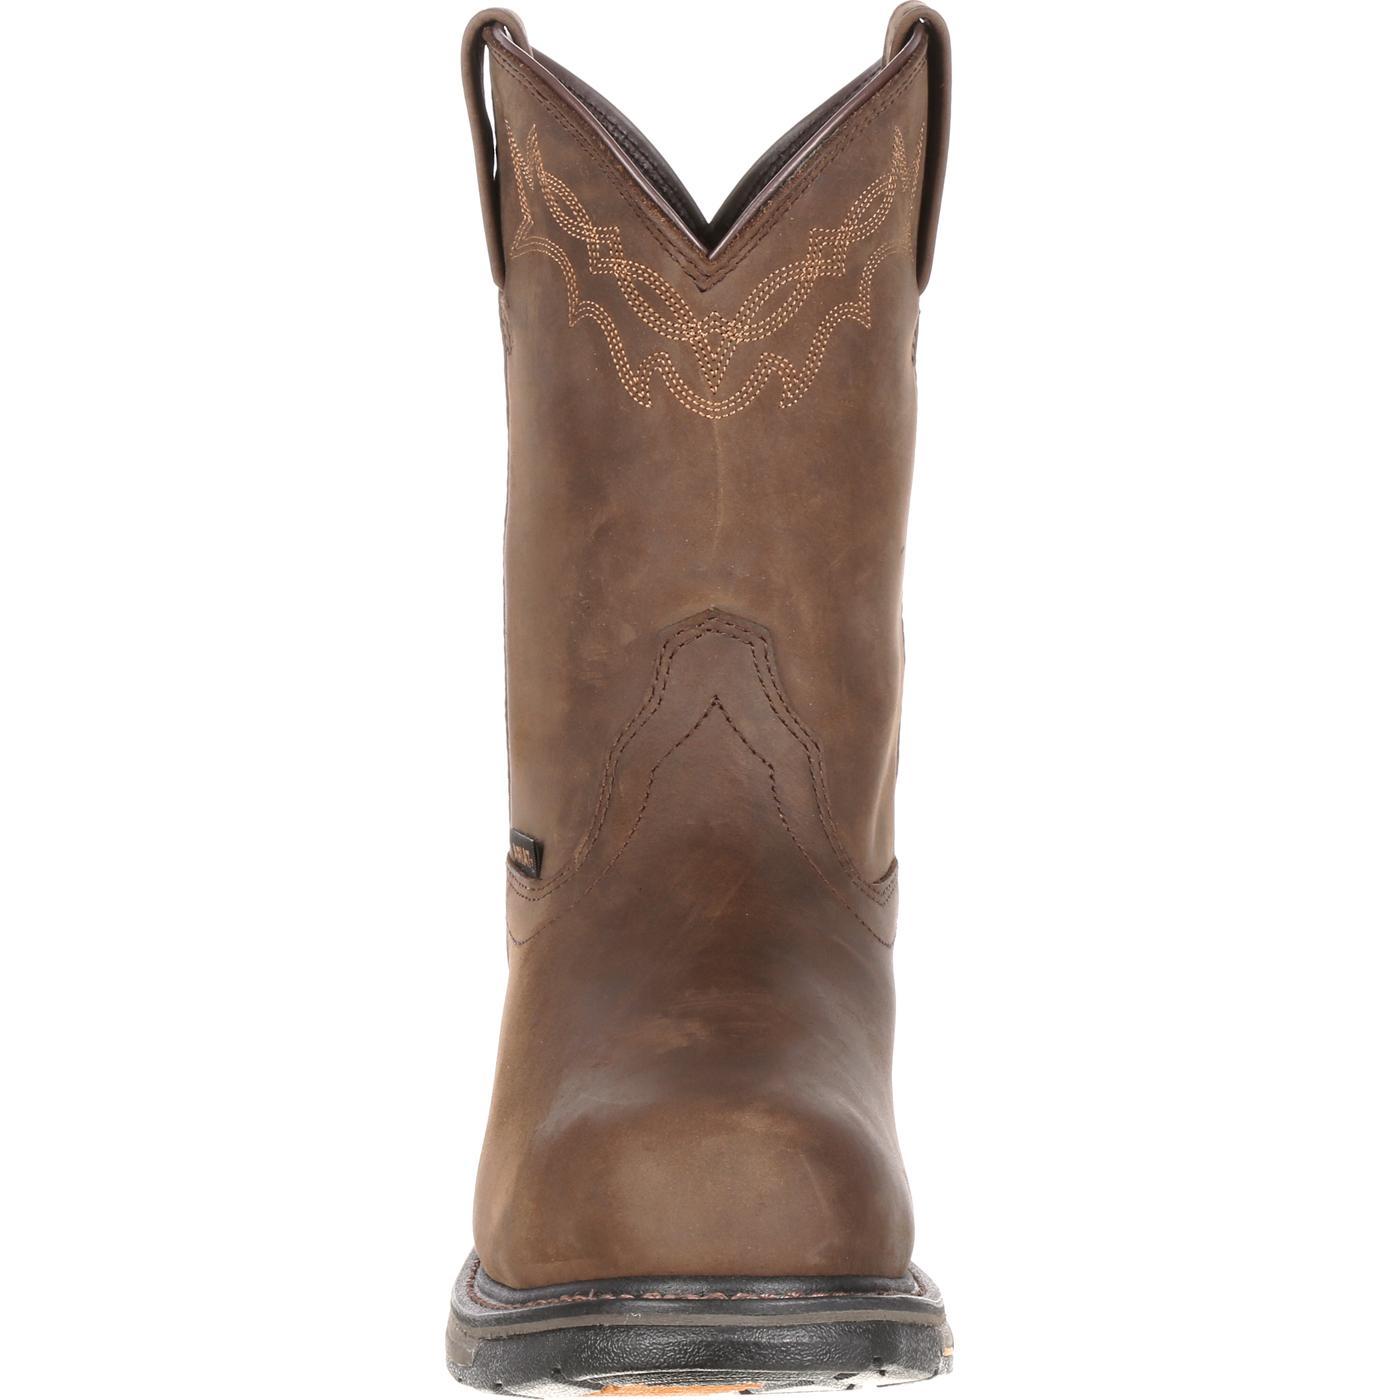 cbb900fa088 Ariat WorkHog H2O Composite Toe Waterproof Western Work Boot